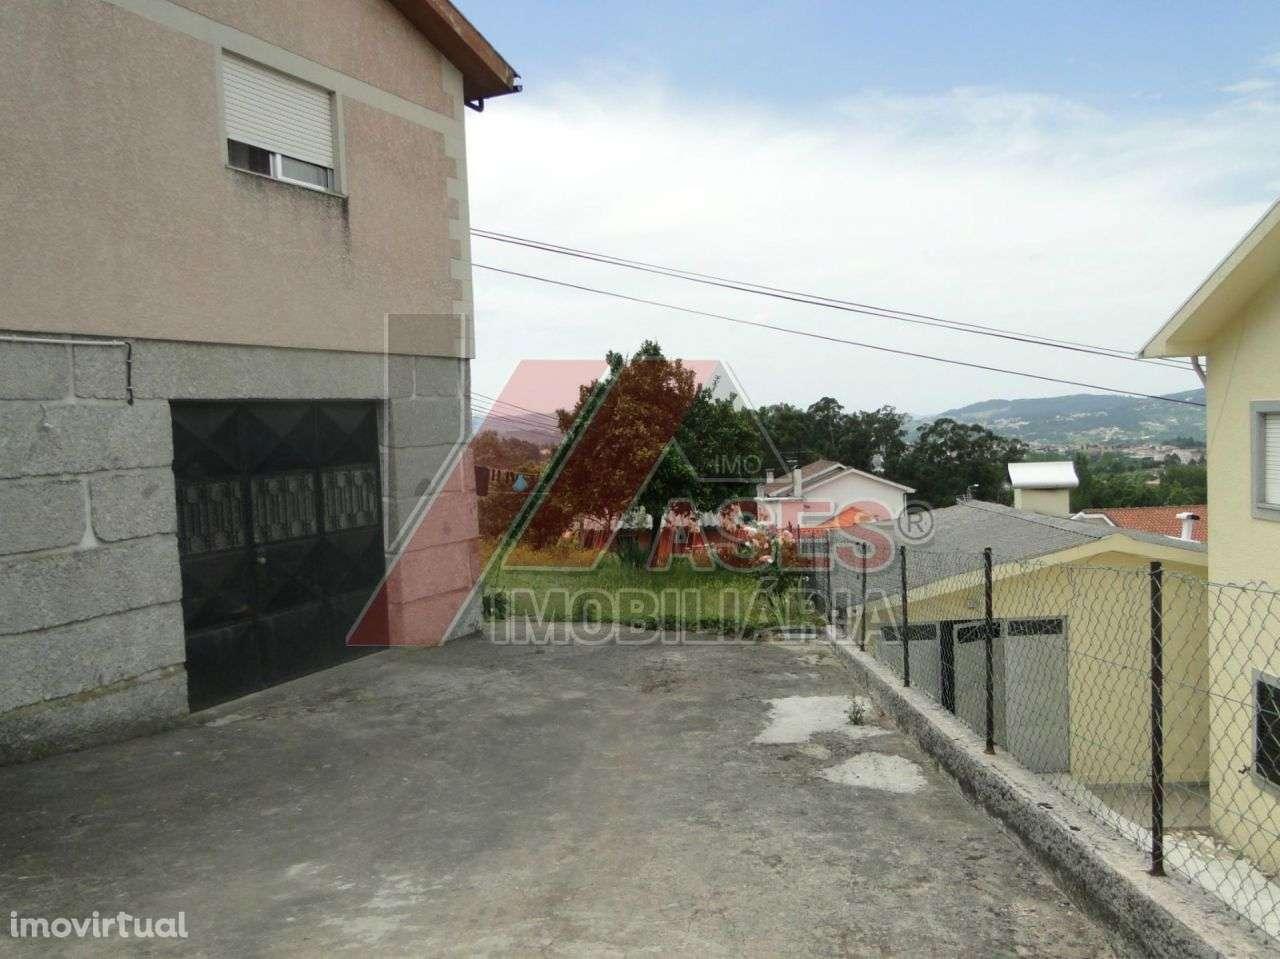 Moradia para comprar, Estorãos, Braga - Foto 14